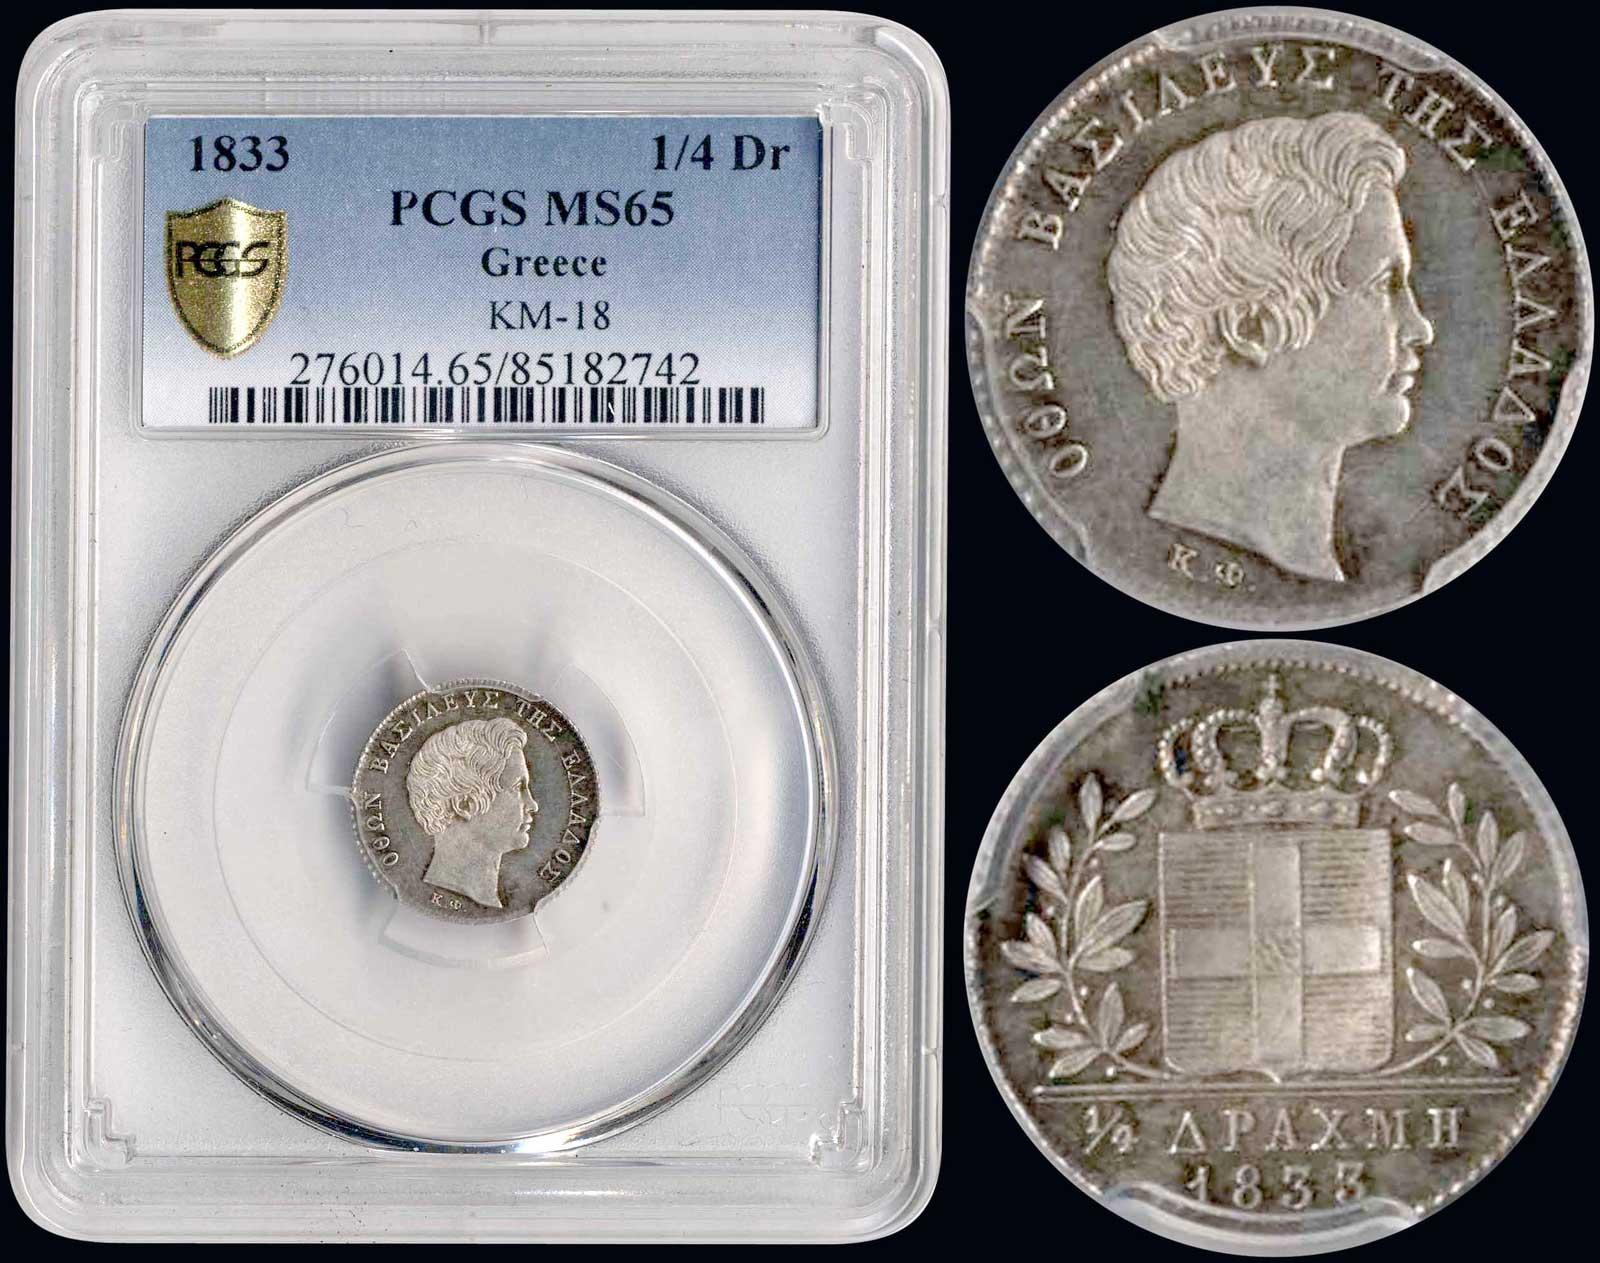 Lot 9059 - GREECE-  COINS & TOKENS king otto -  A. Karamitsos Public & LIVE Bid Auction 606 Coins, Medals & Banknotes